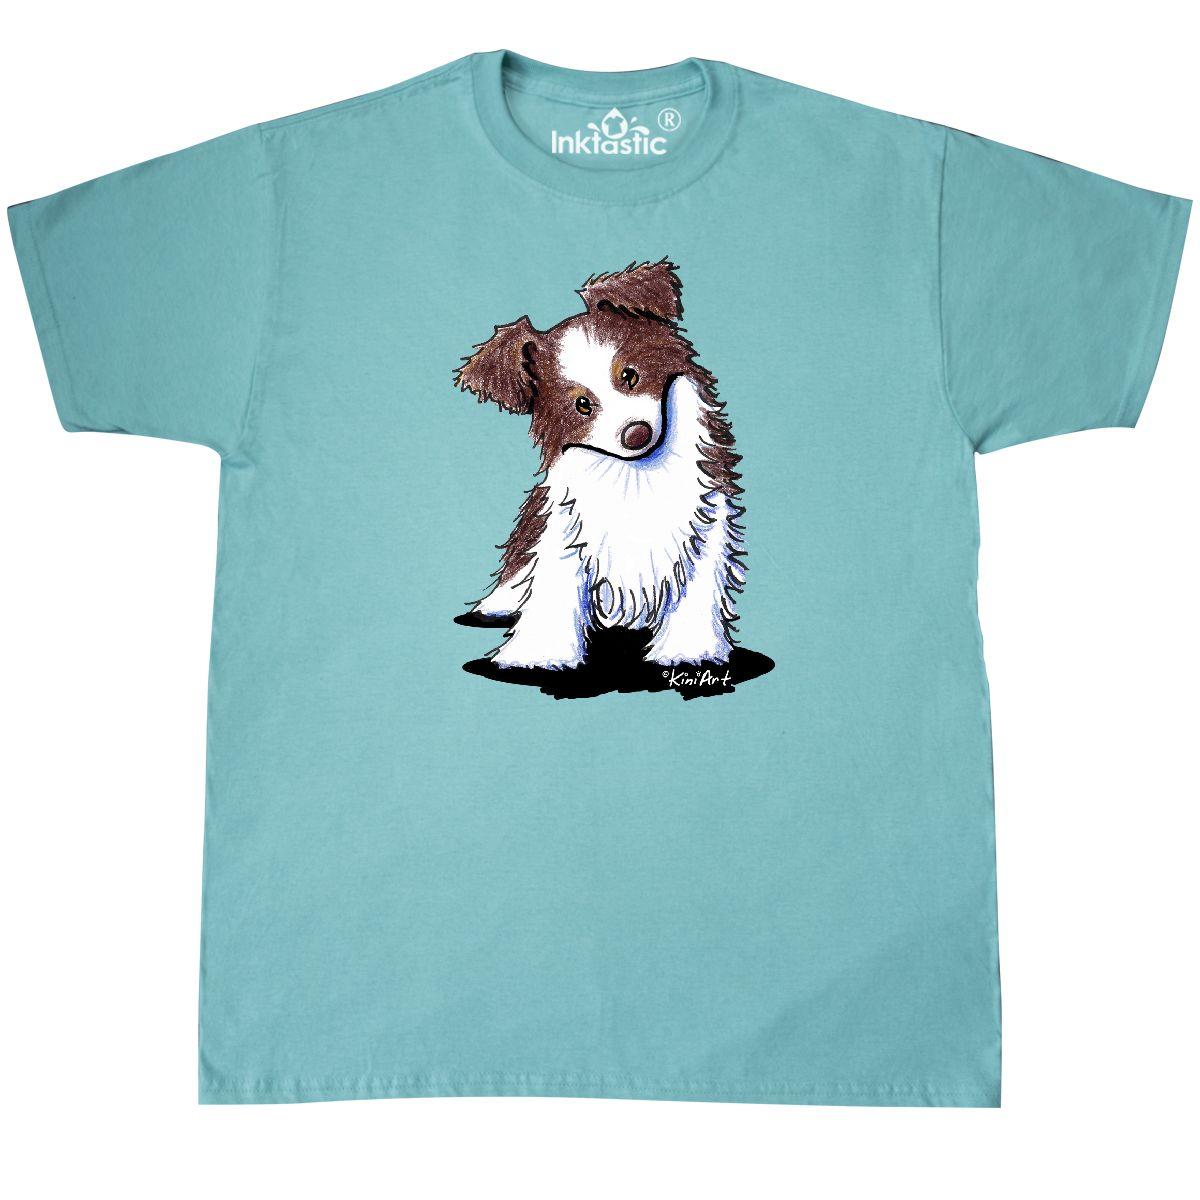 Inktastic-Australian-Shepherd-T-Shirt-KiniArt-Aussie-Puppy-Red-Sheepdog-Dog